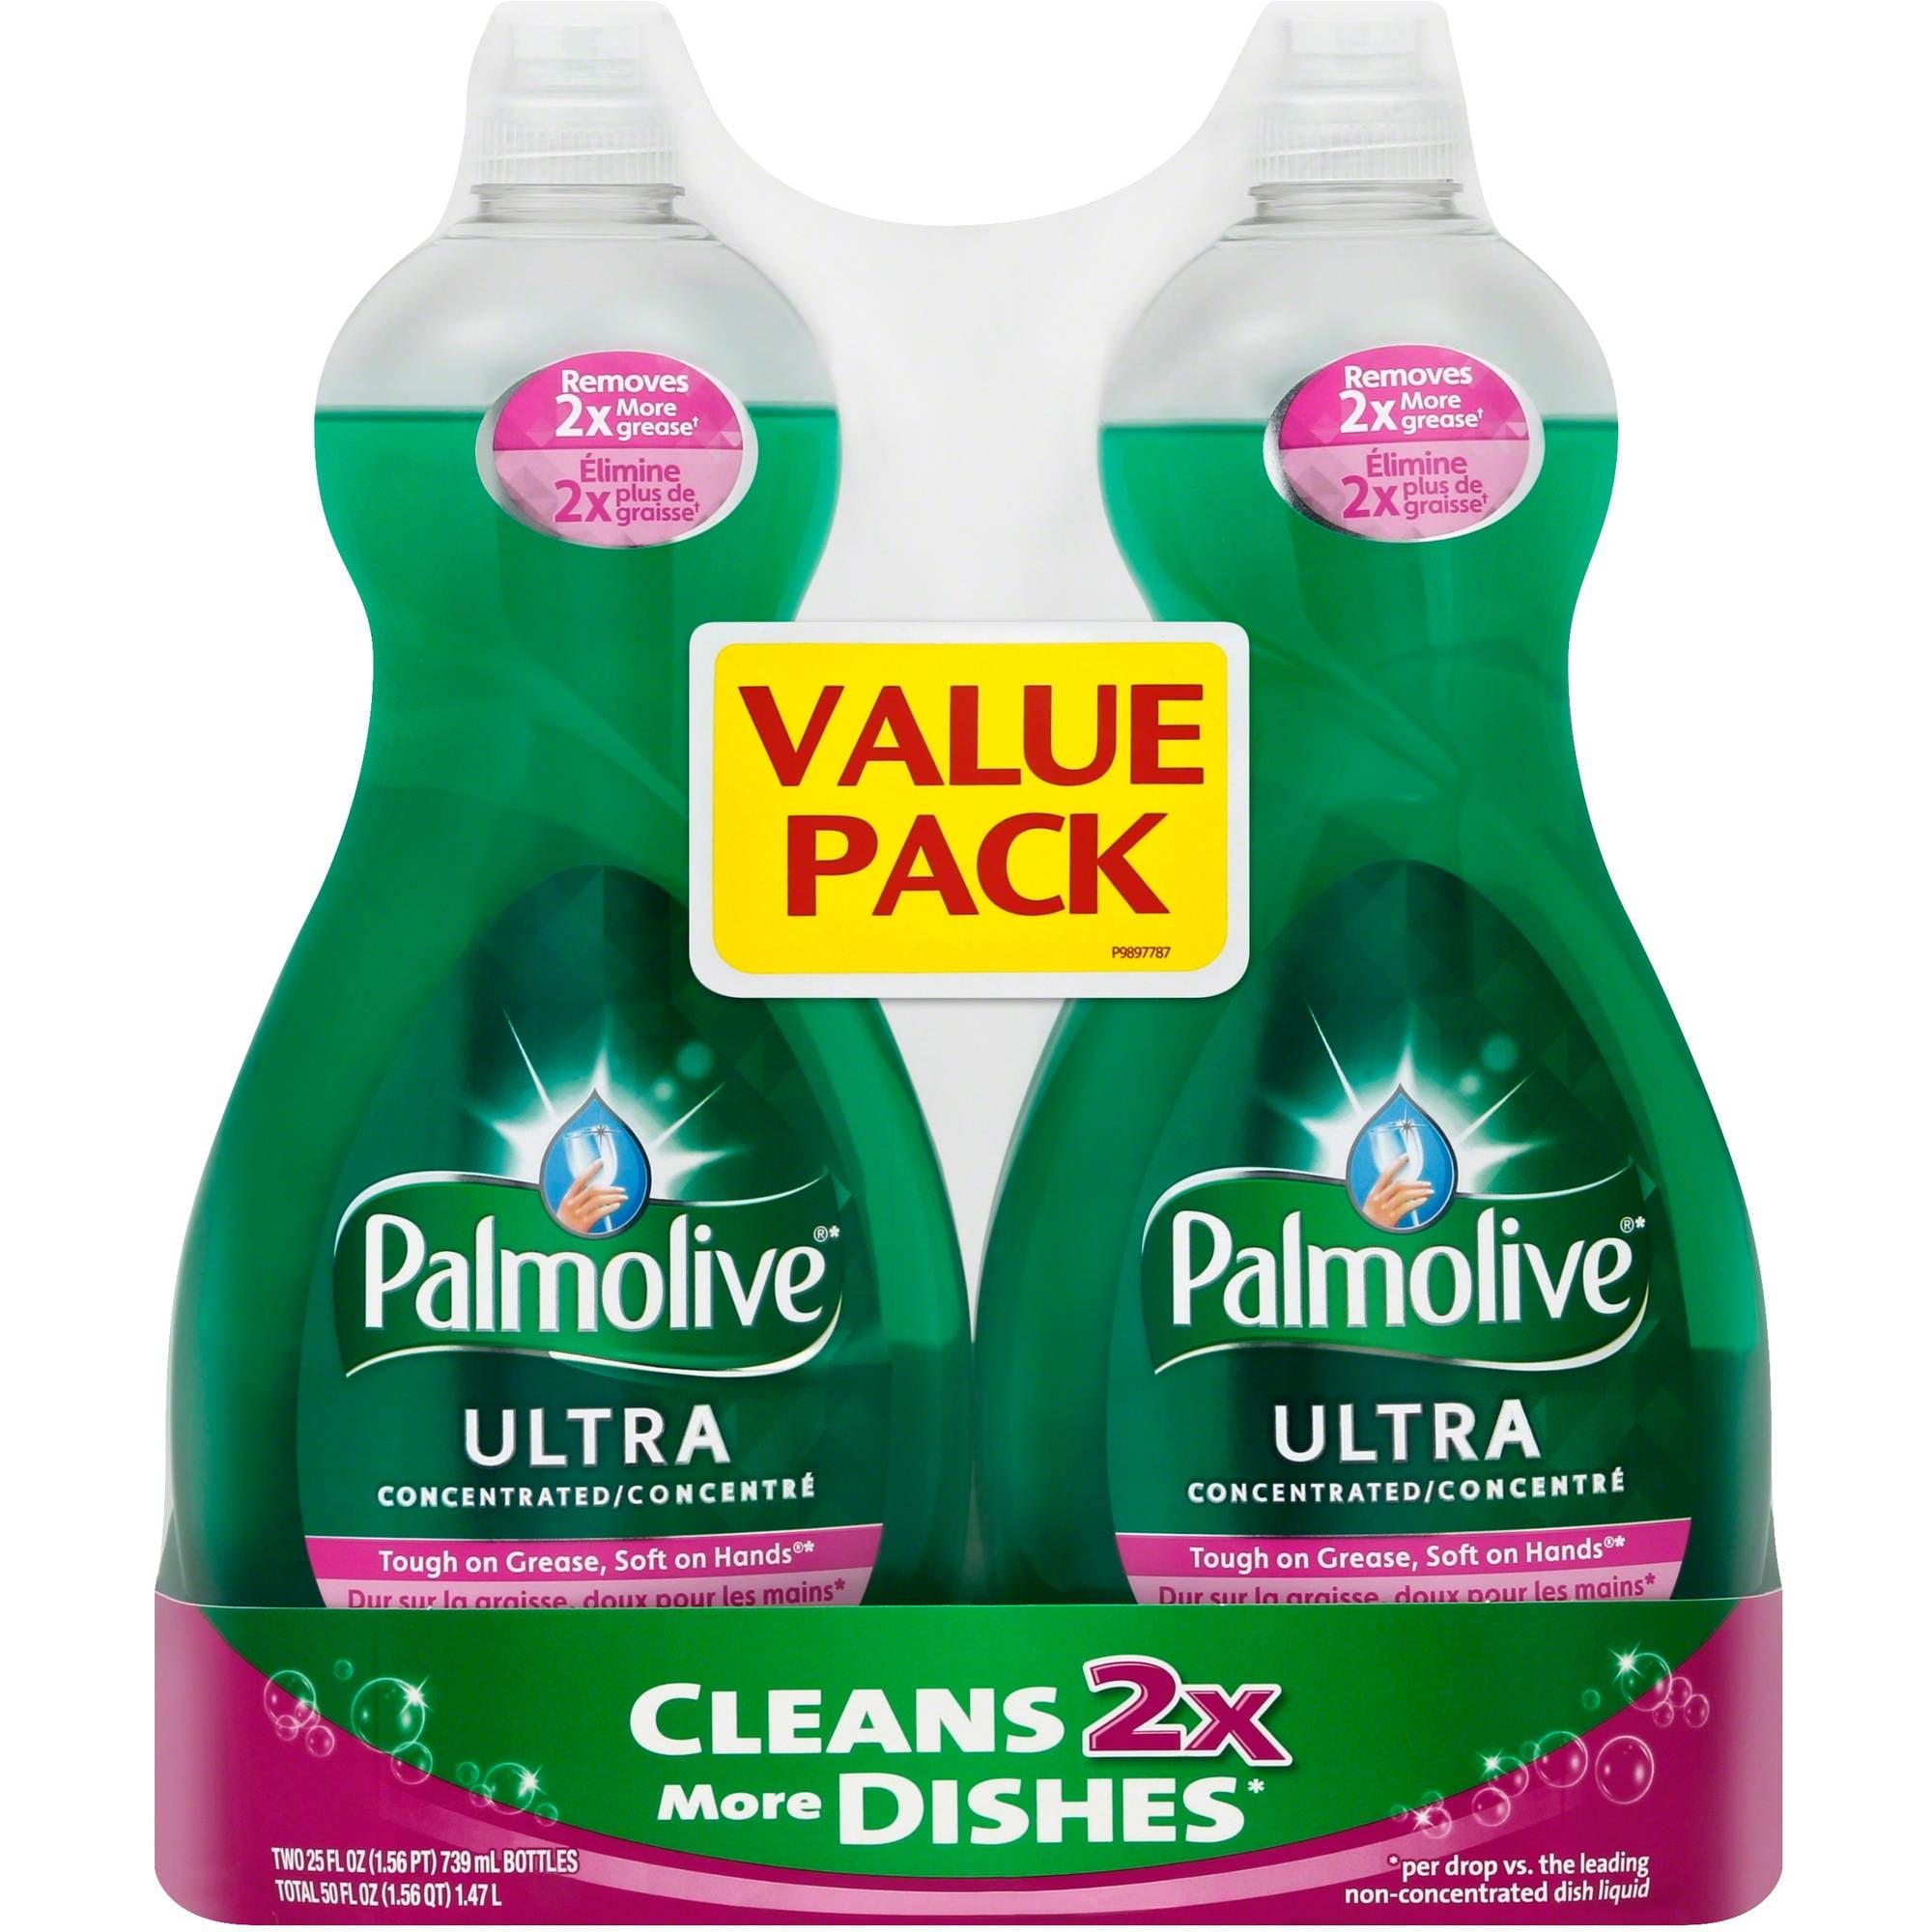 Palmolive Original Concentrated Dish Liquid, 25 oz, 2ct